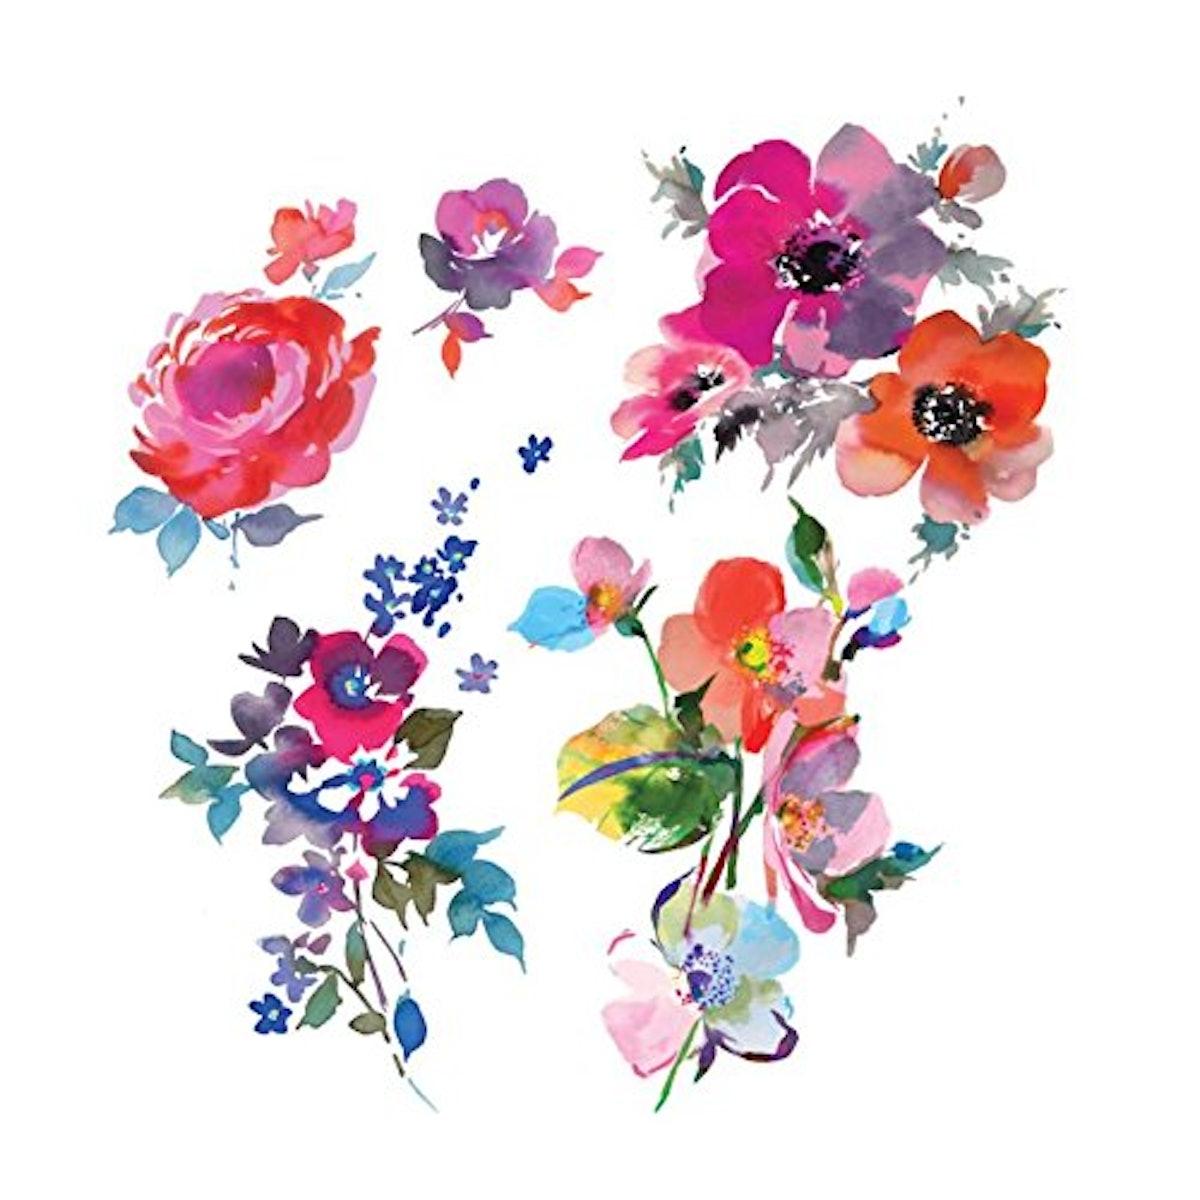 Tattly Temporary Tattoos Watercolor Florals Sheets (2 Sheets)